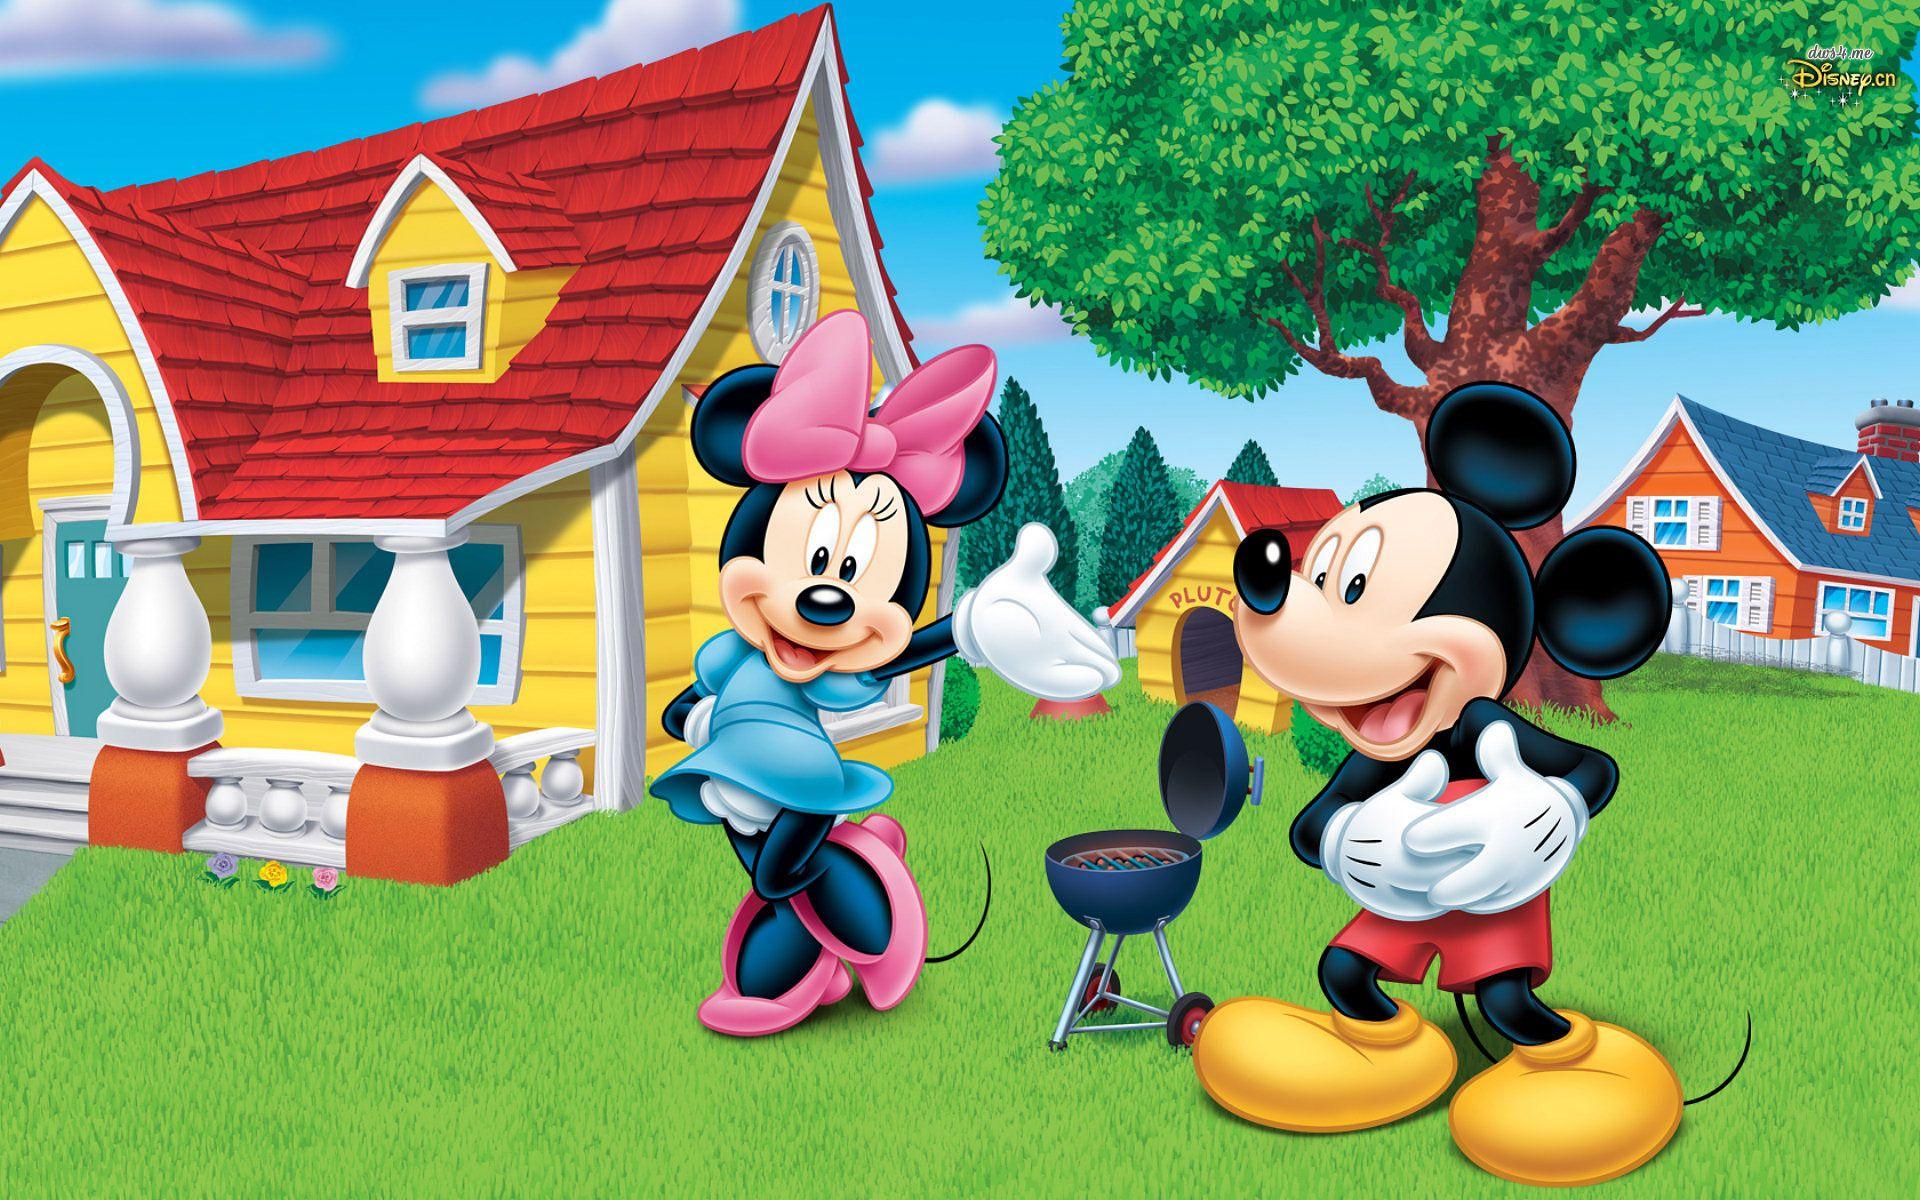 Pin De Antonia Ortega En Disney Dibujos Animados De Mickey Mouse Dibujos De Mickey Mouse Imagenes De Mickey